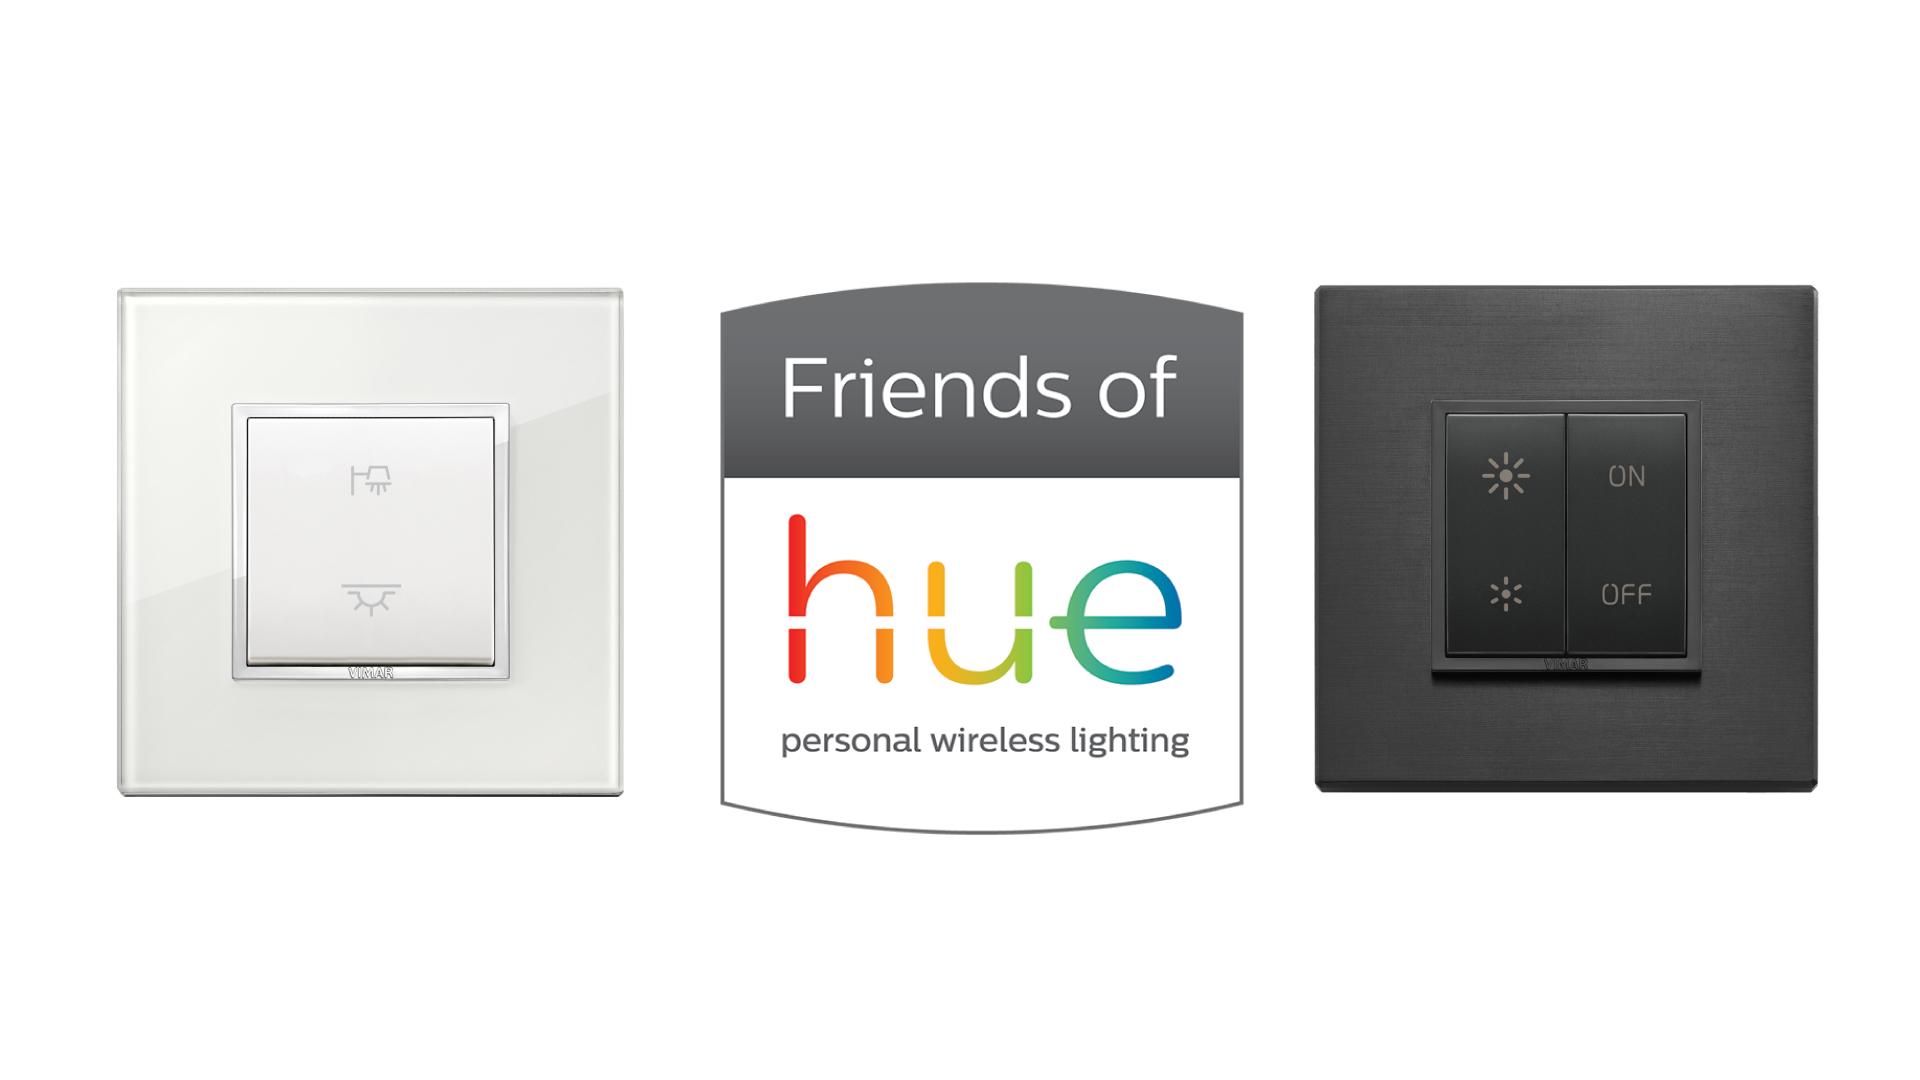 Vimar and Philips Lighting - Vimar energia positiva